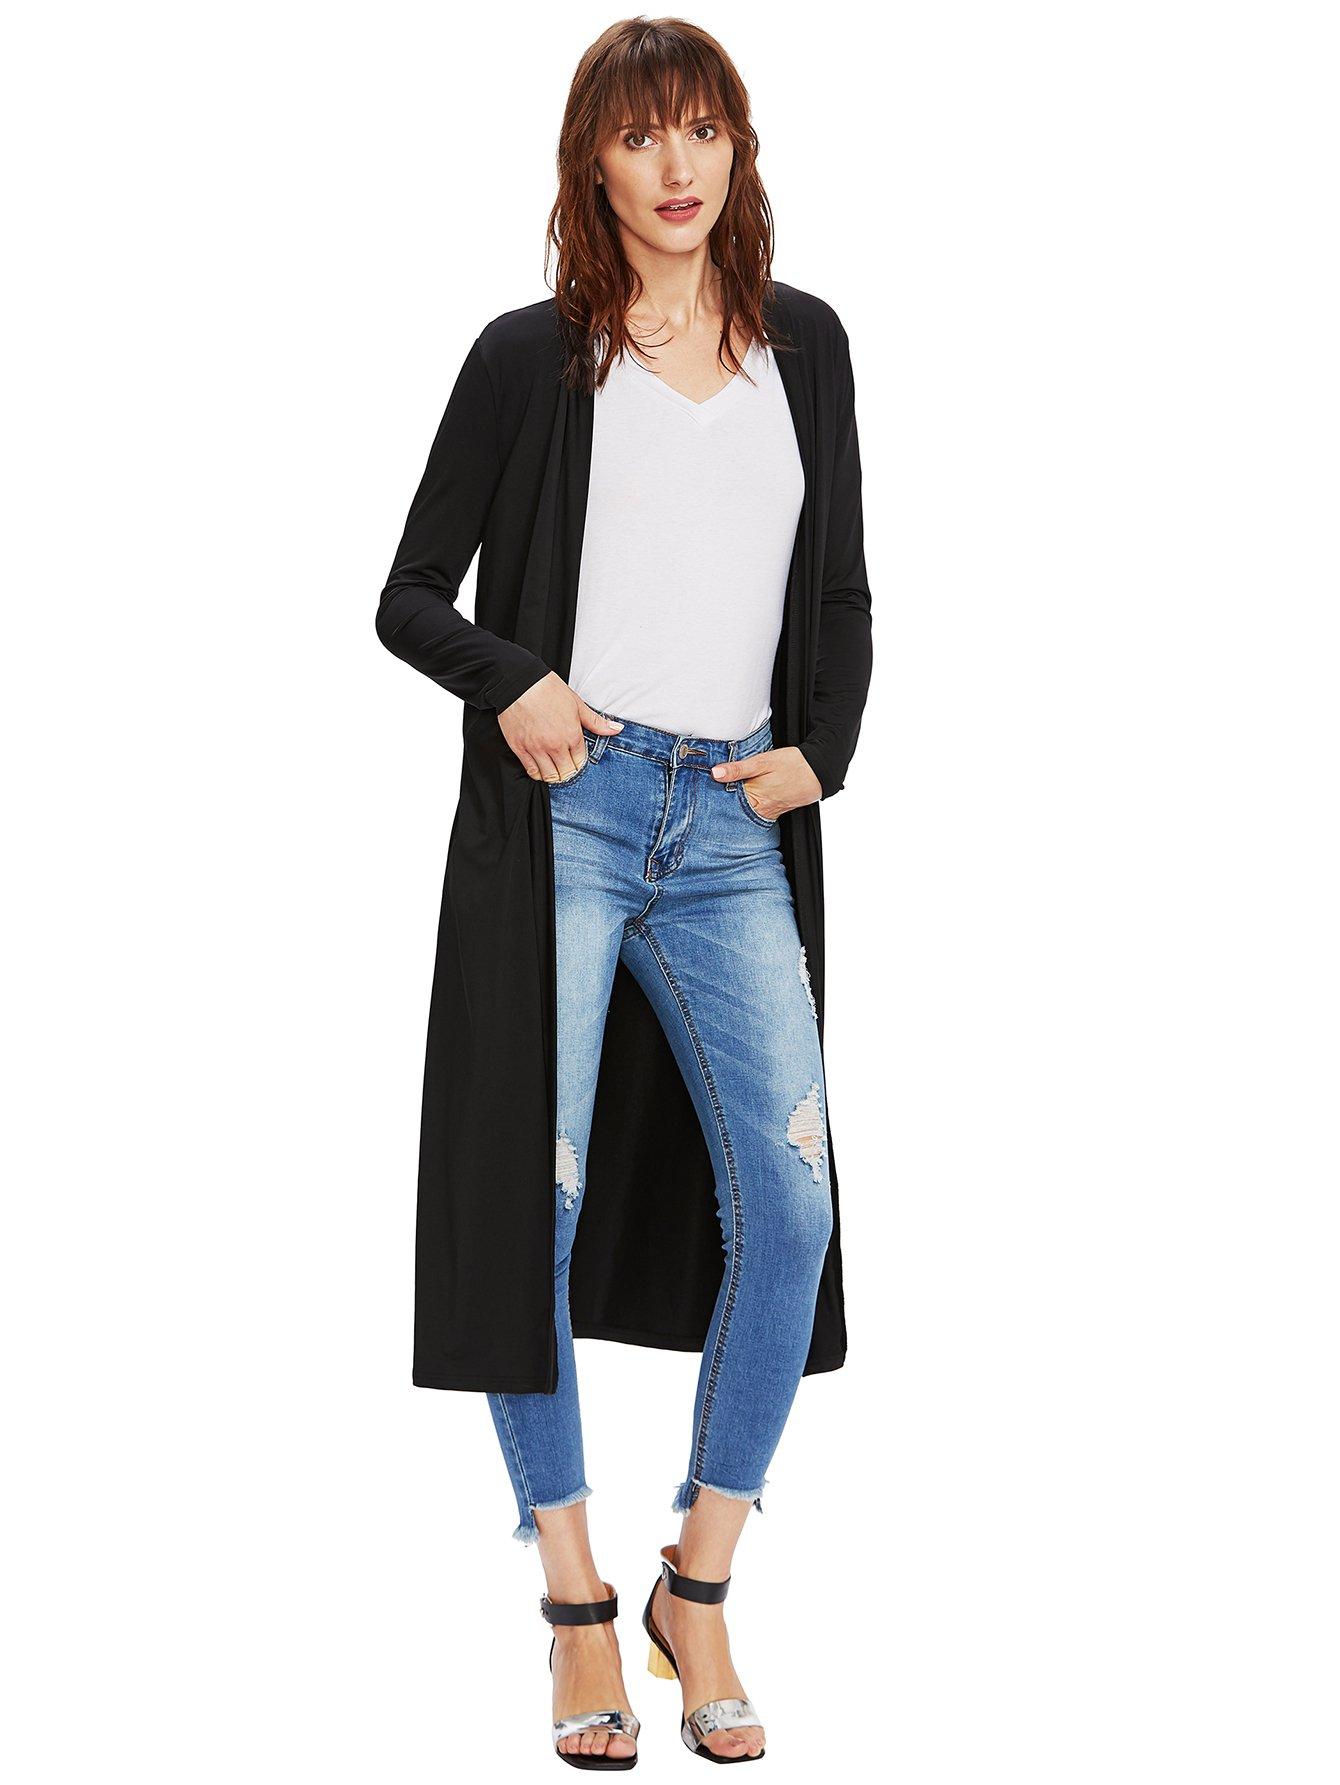 Verdusa Women's Long Sleeve Open Front Long Maxi Cardigan Longline Duster Coat Black M by Verdusa (Image #7)